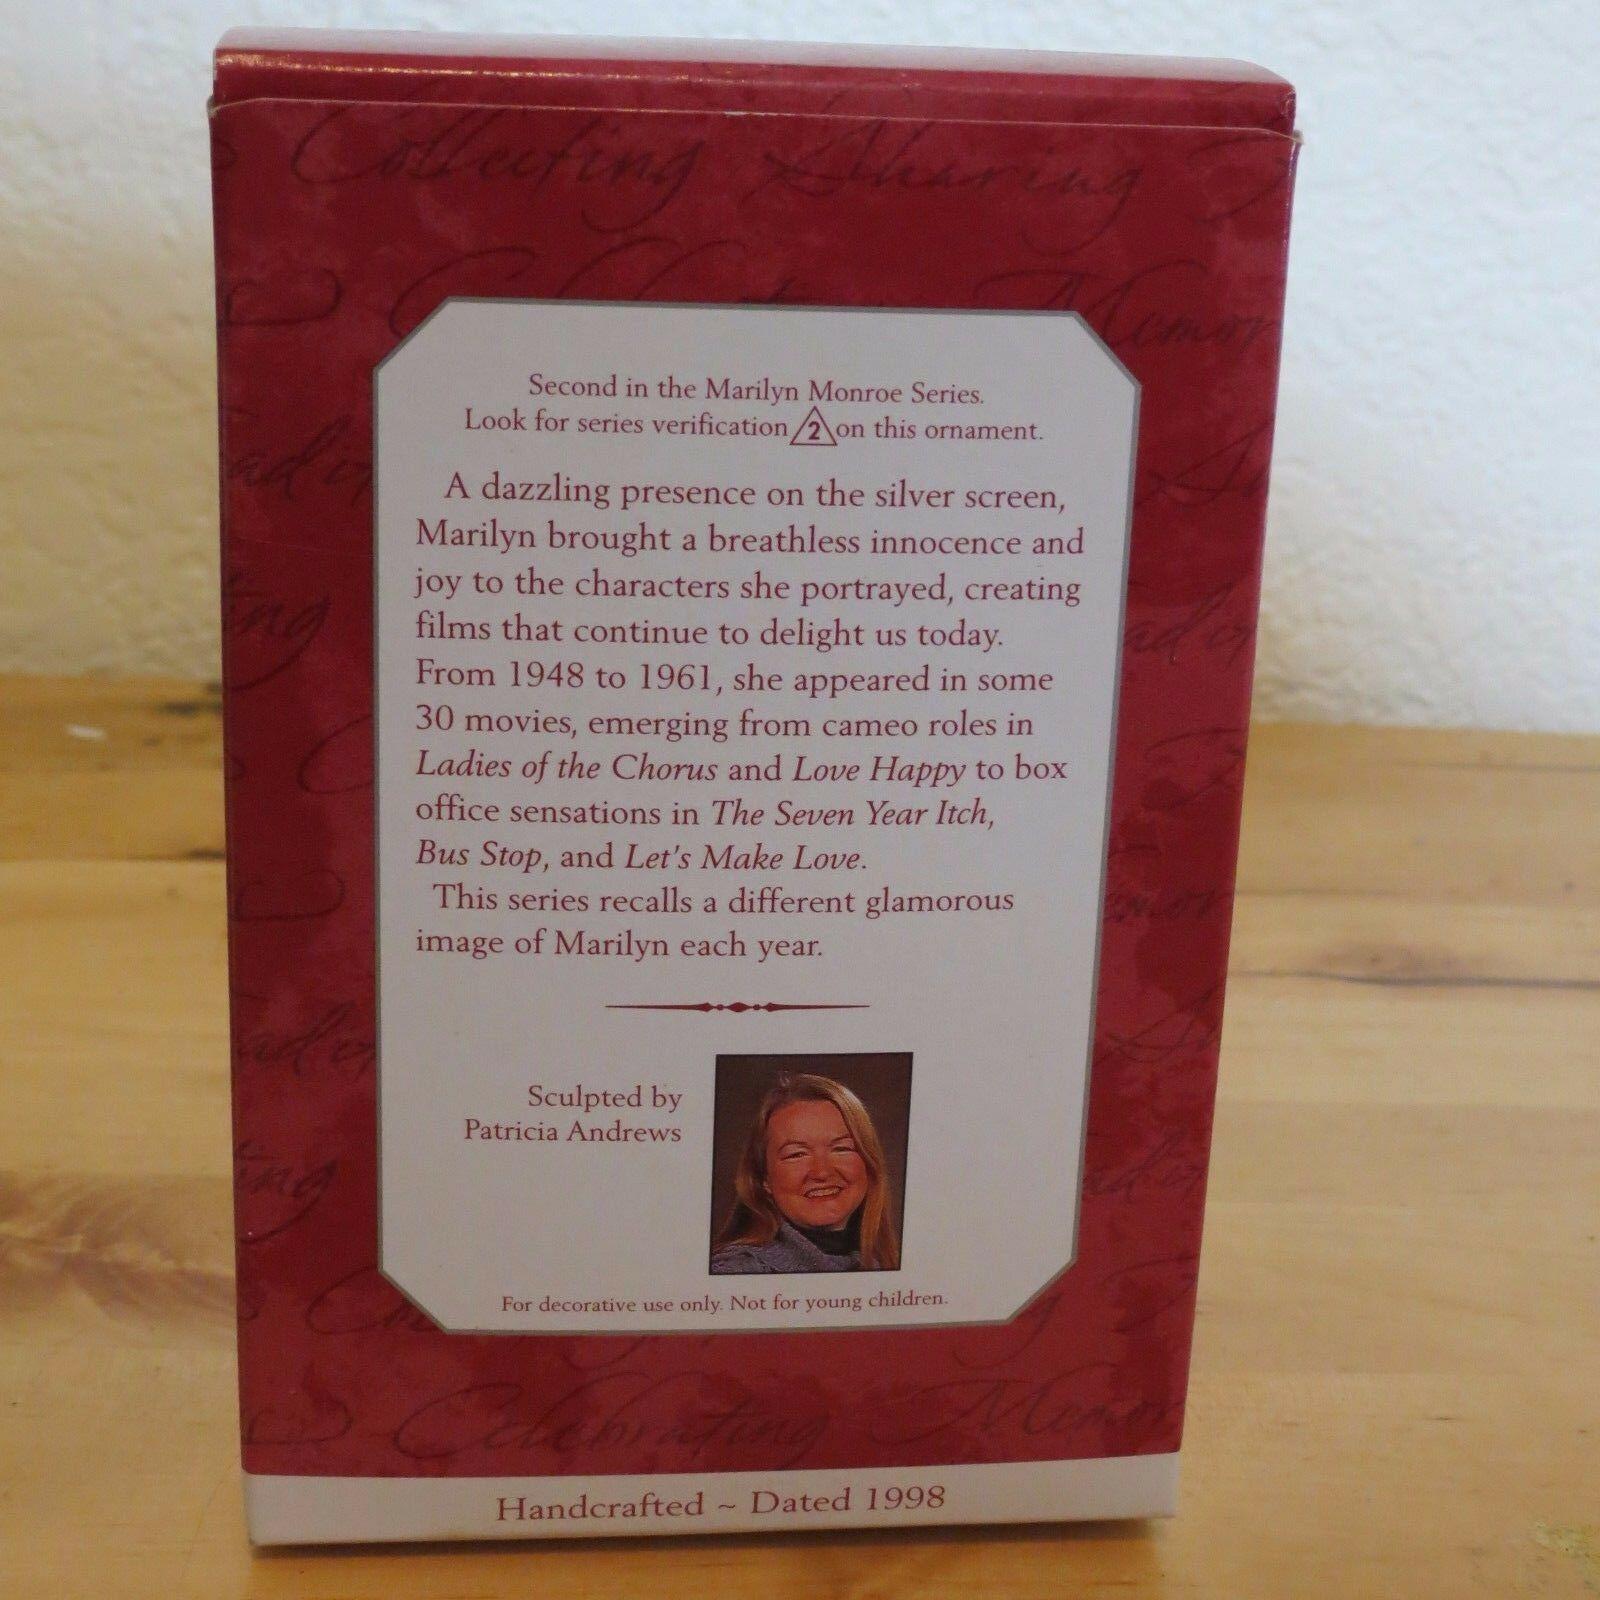 Marilyn Monroe Hallmark Keepsake Ornament 1998  in original box Seven Year Itch image 5